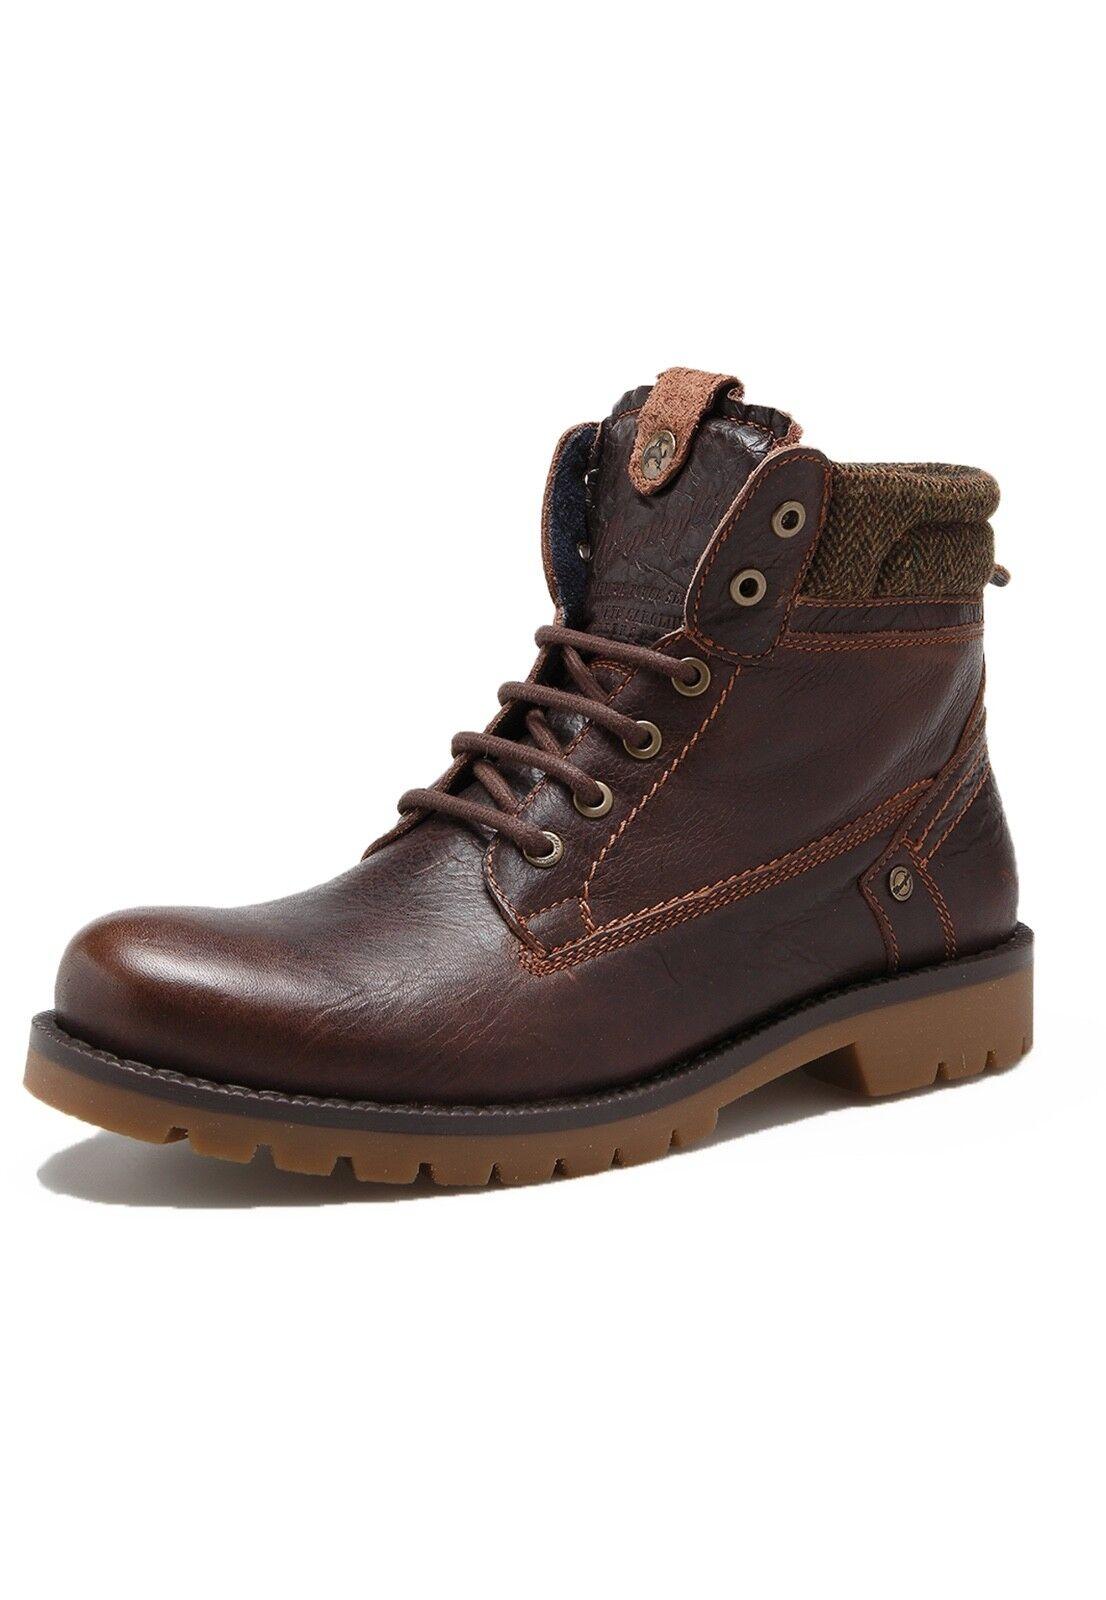 Wrangler Creek Tweed Stiefel High schuhe Dark braun Leather Leather Leather Biker Cowboy Jean Stiefel  91cdb1